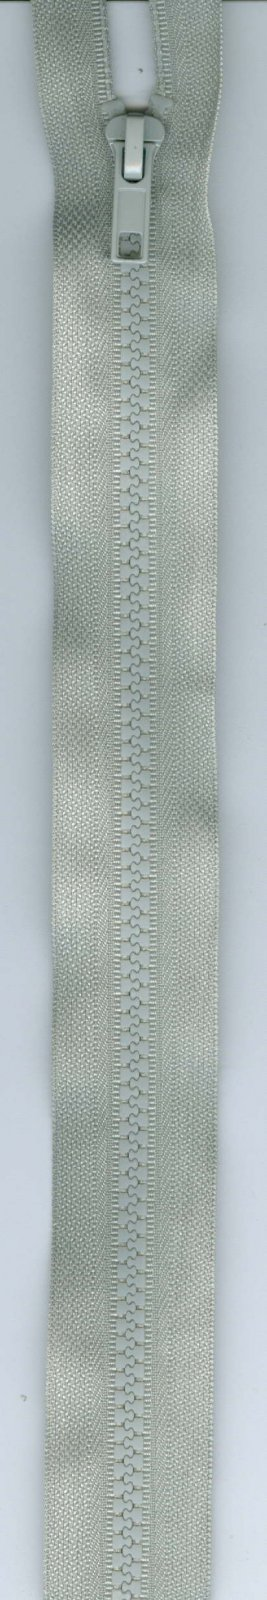 24 Separating Zipper #5 - Gray